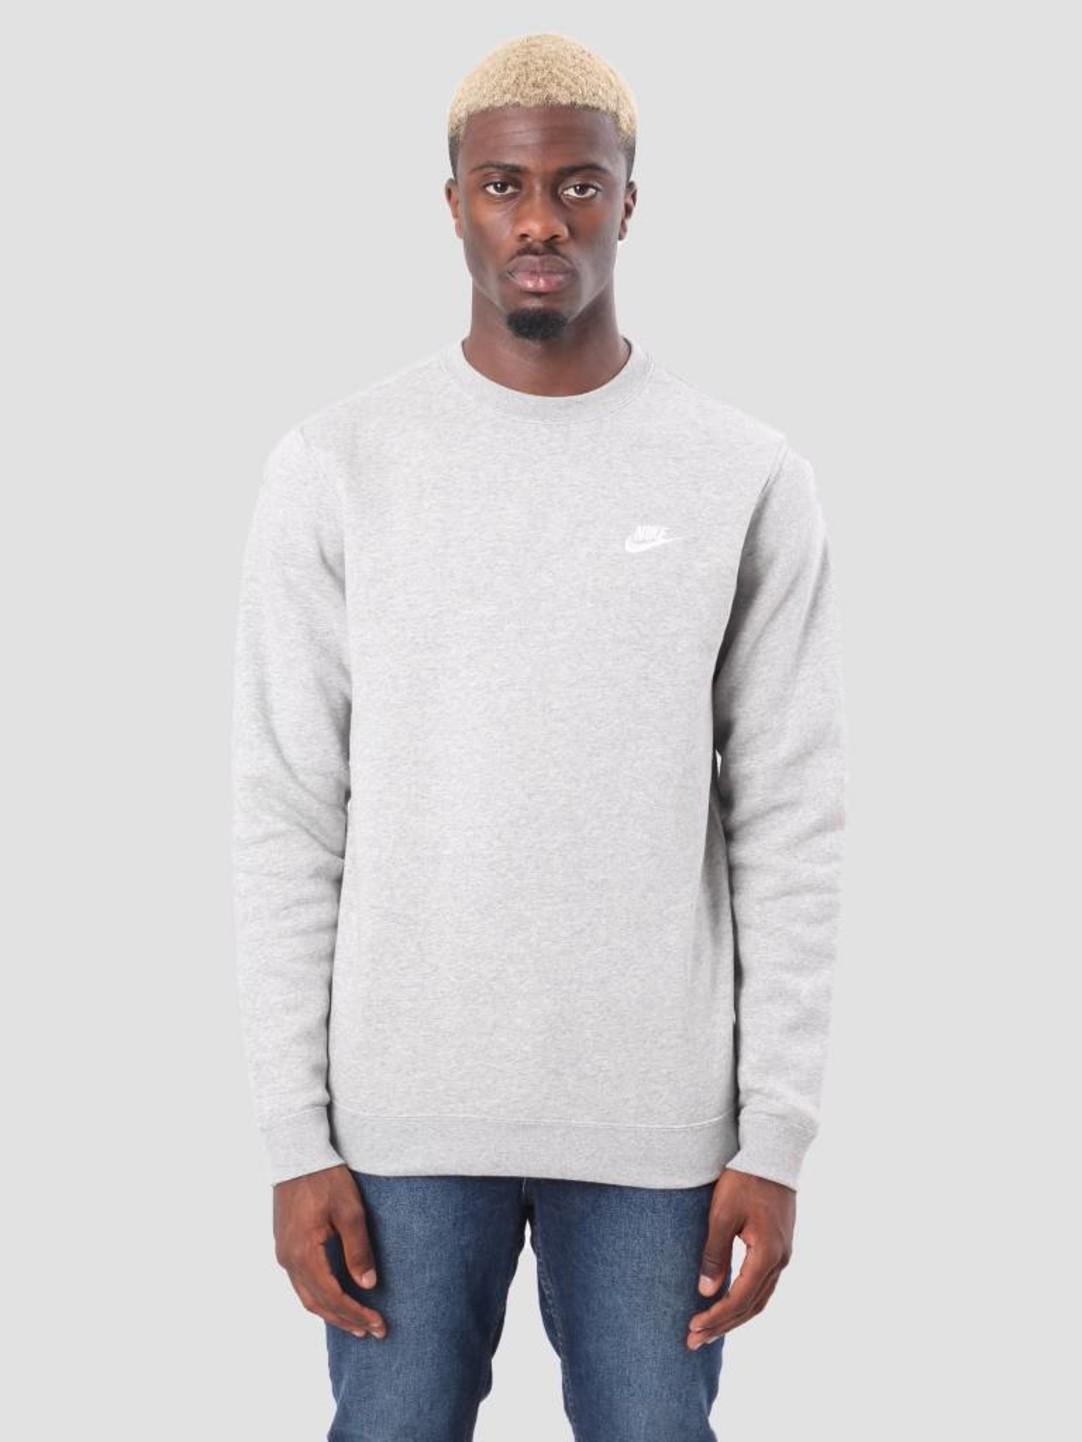 17aaa585 Nike Sportswear Crew Dk Grey Heather White 804340-063 | FRESHCOTTON